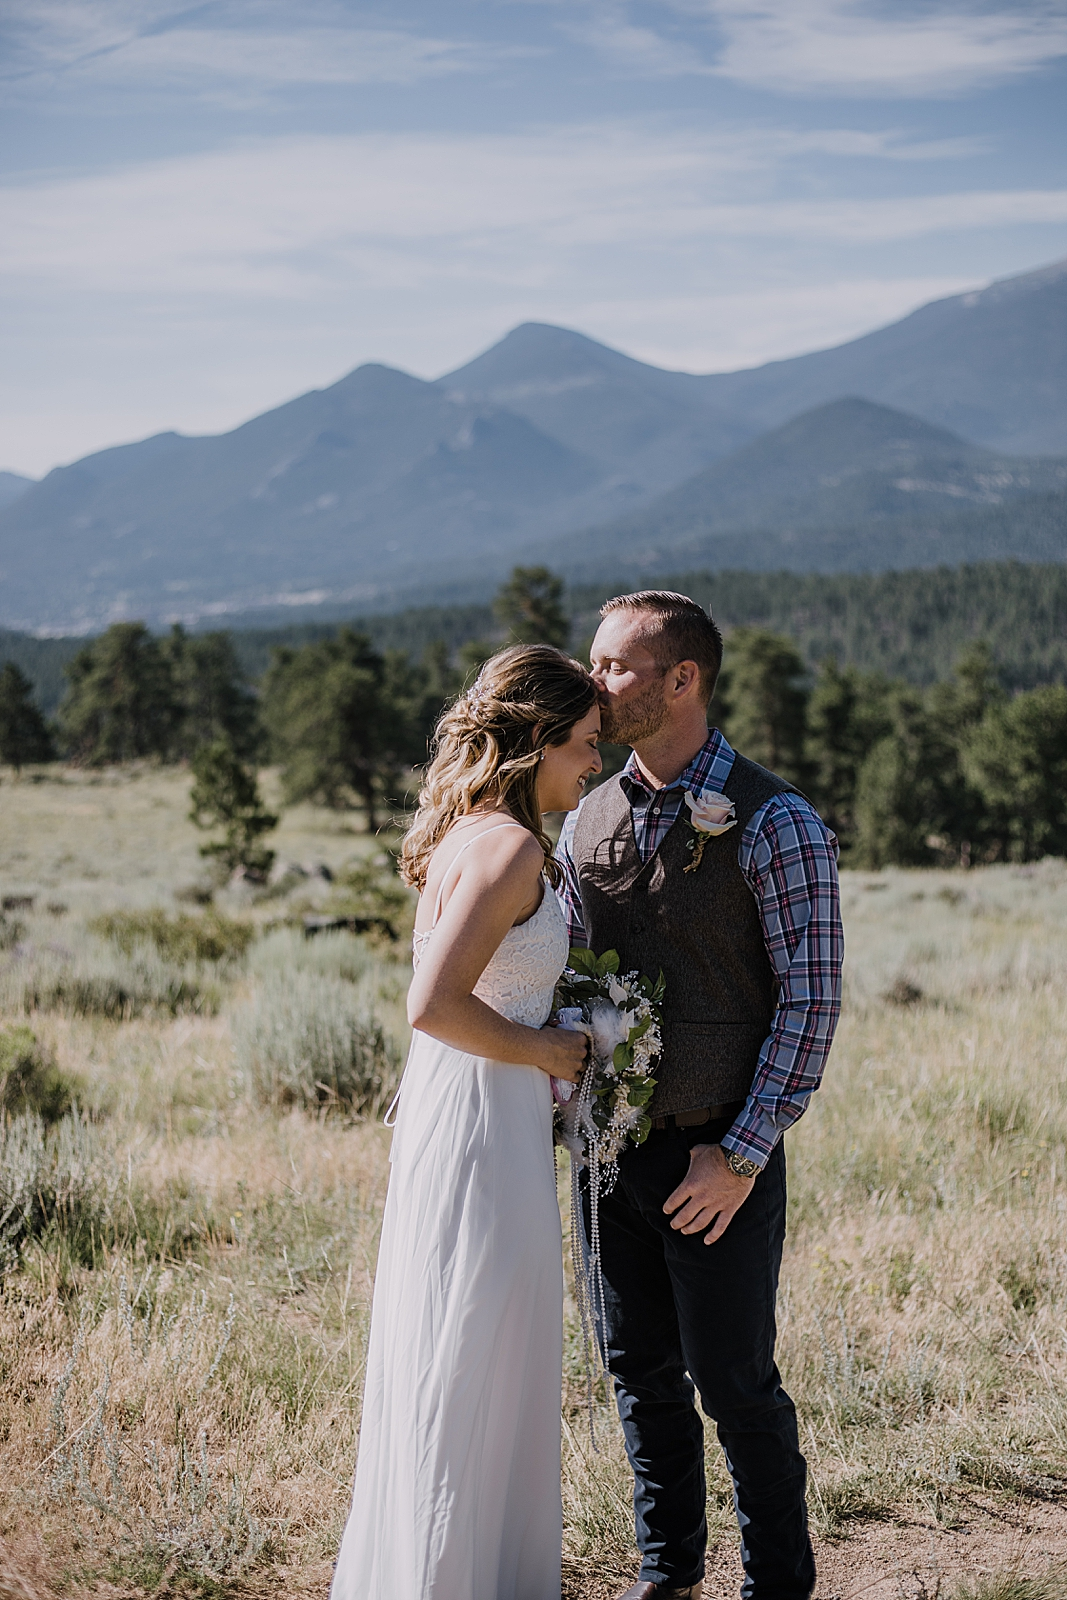 groom kissing bride, rocky mountain national park elopement, 3M curves elopement, self solemnizing, self solemnization, long's peak ceremony, hiking elopement, estes park elopement